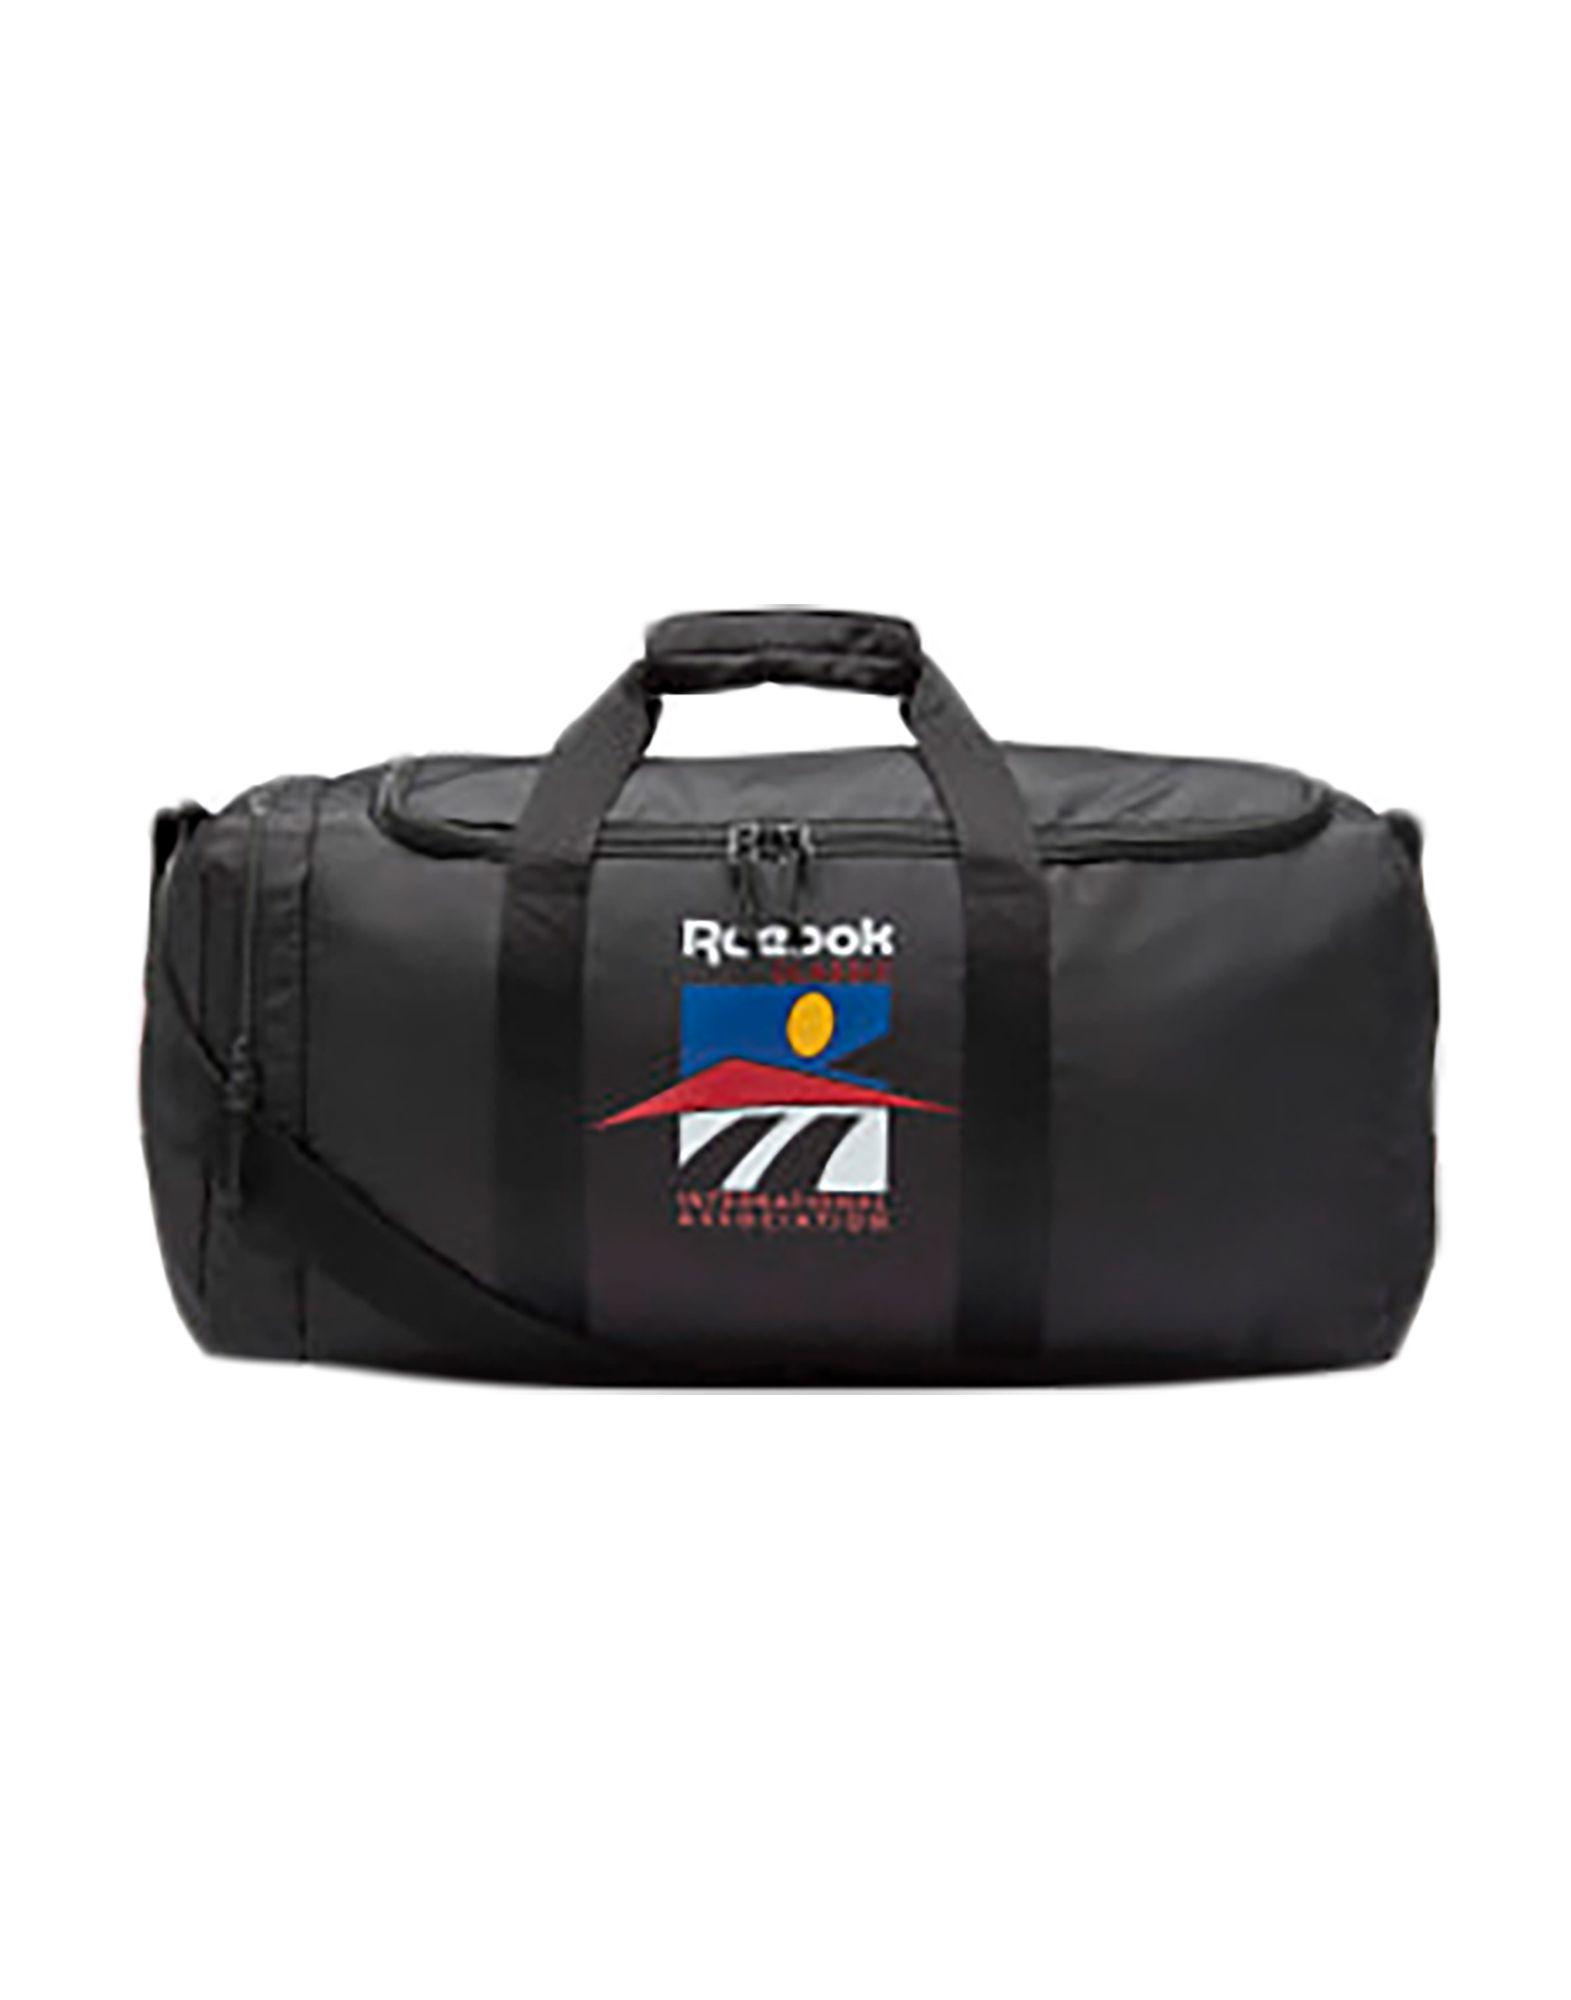 Фото - REEBOK Дорожная сумка сумка reebok act enh work gymsack цвет черный cv5774